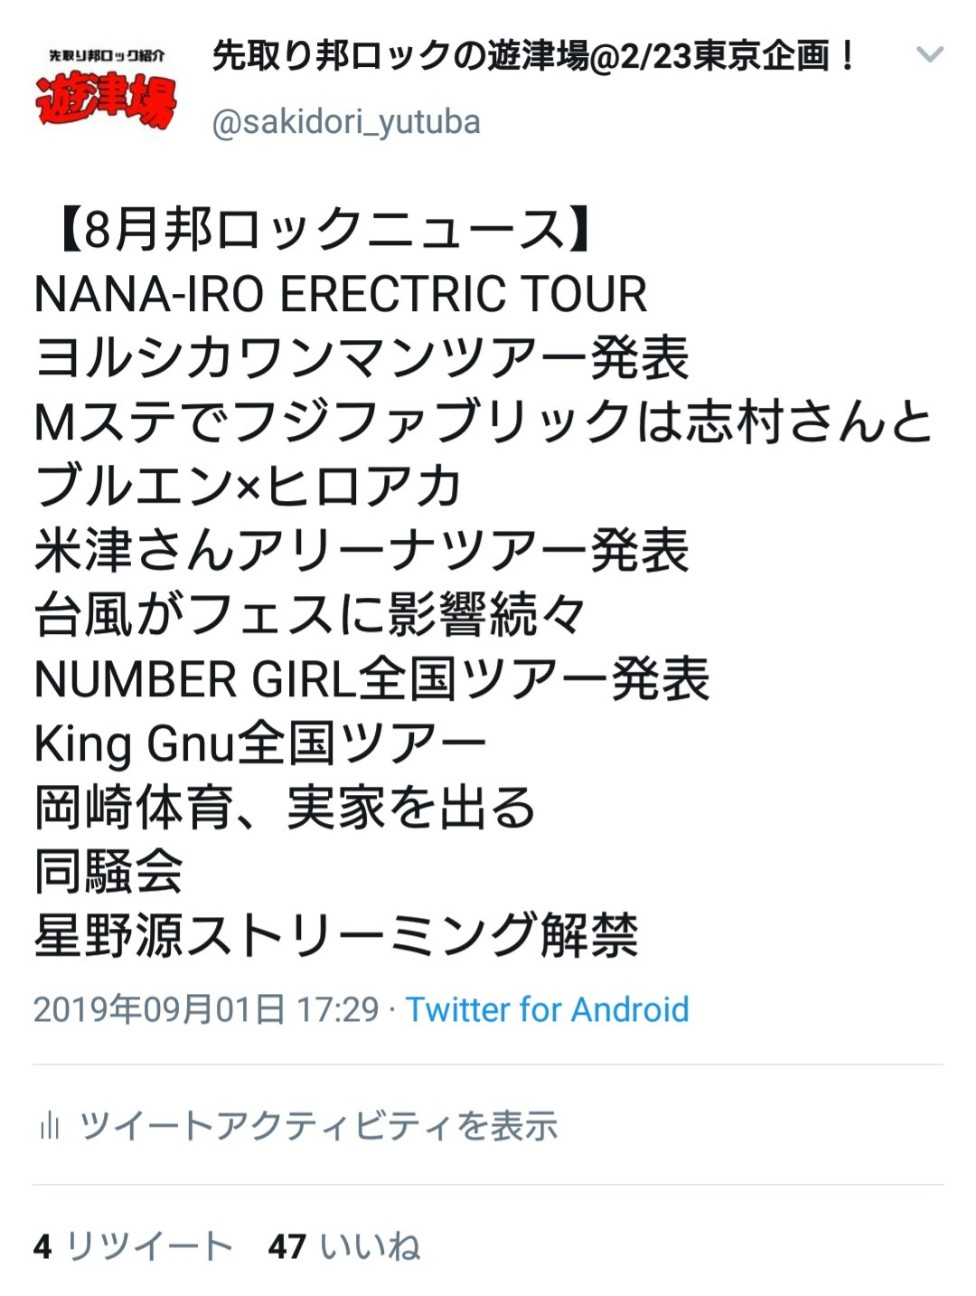 f:id:sakidoriyutsubarock:20191218111714j:plain